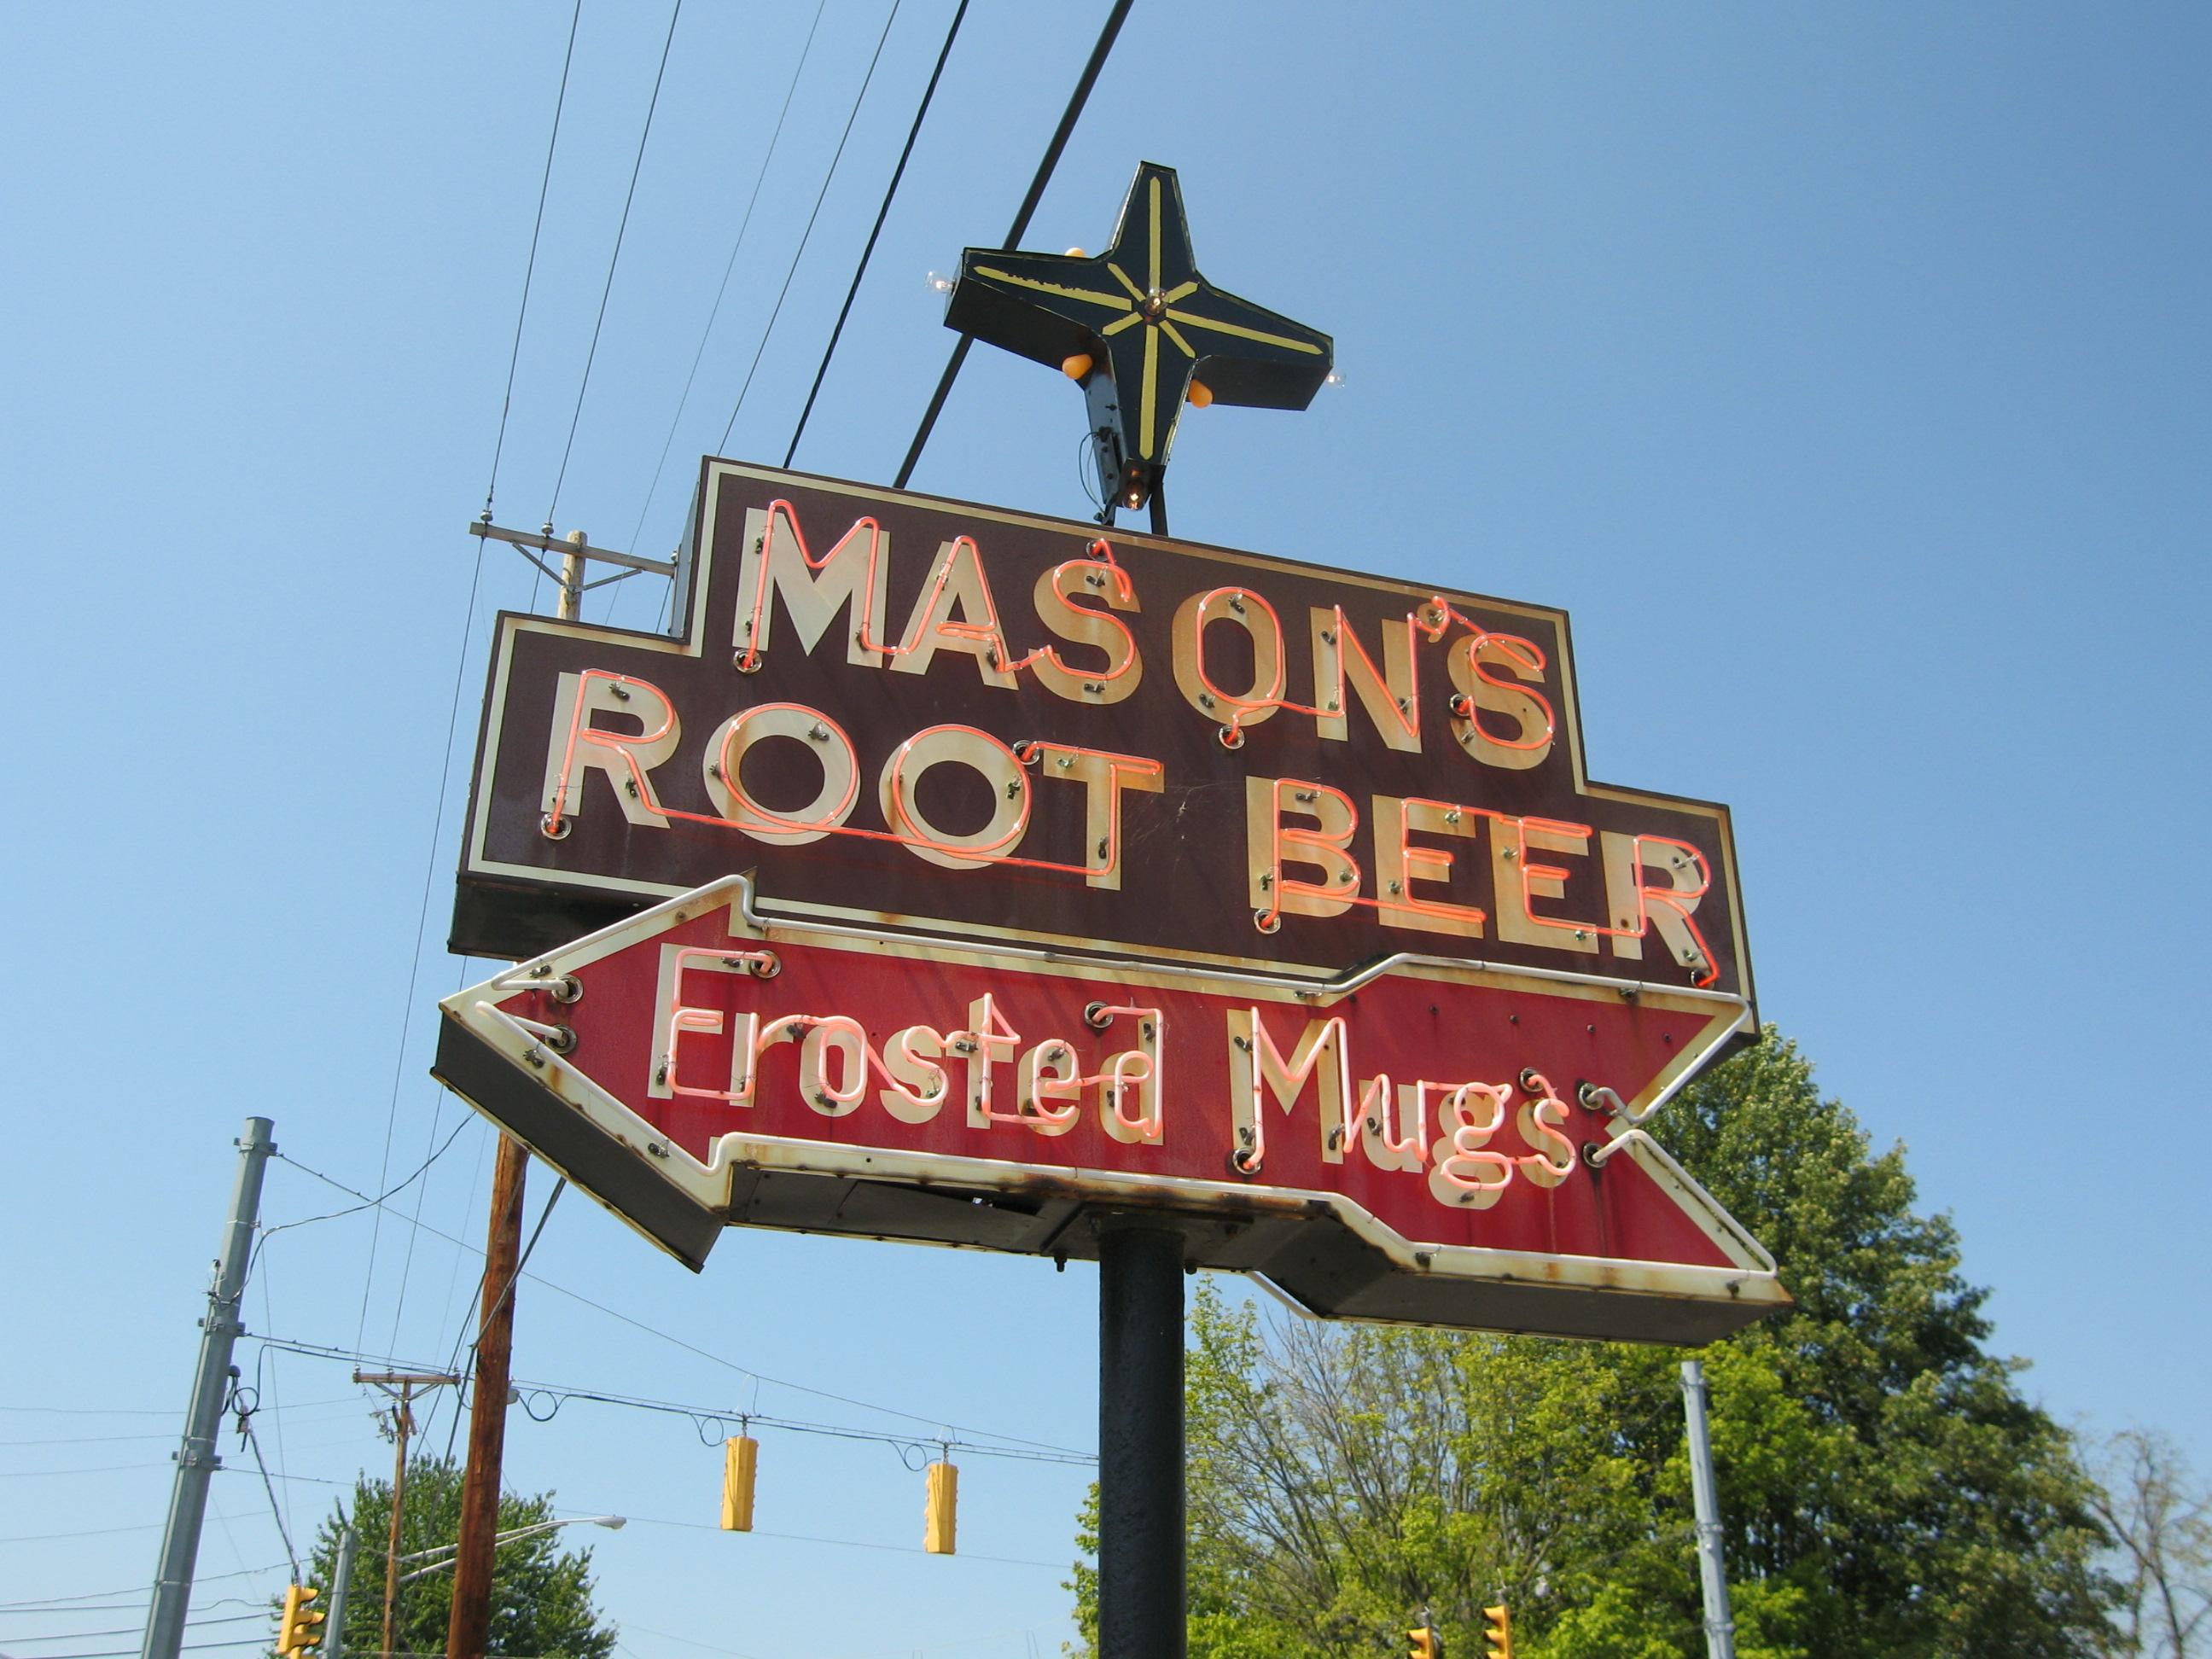 Mason's Root Beer - 1201 East National Highway, Washington, Indiana U.S.A. - August 28, 2010